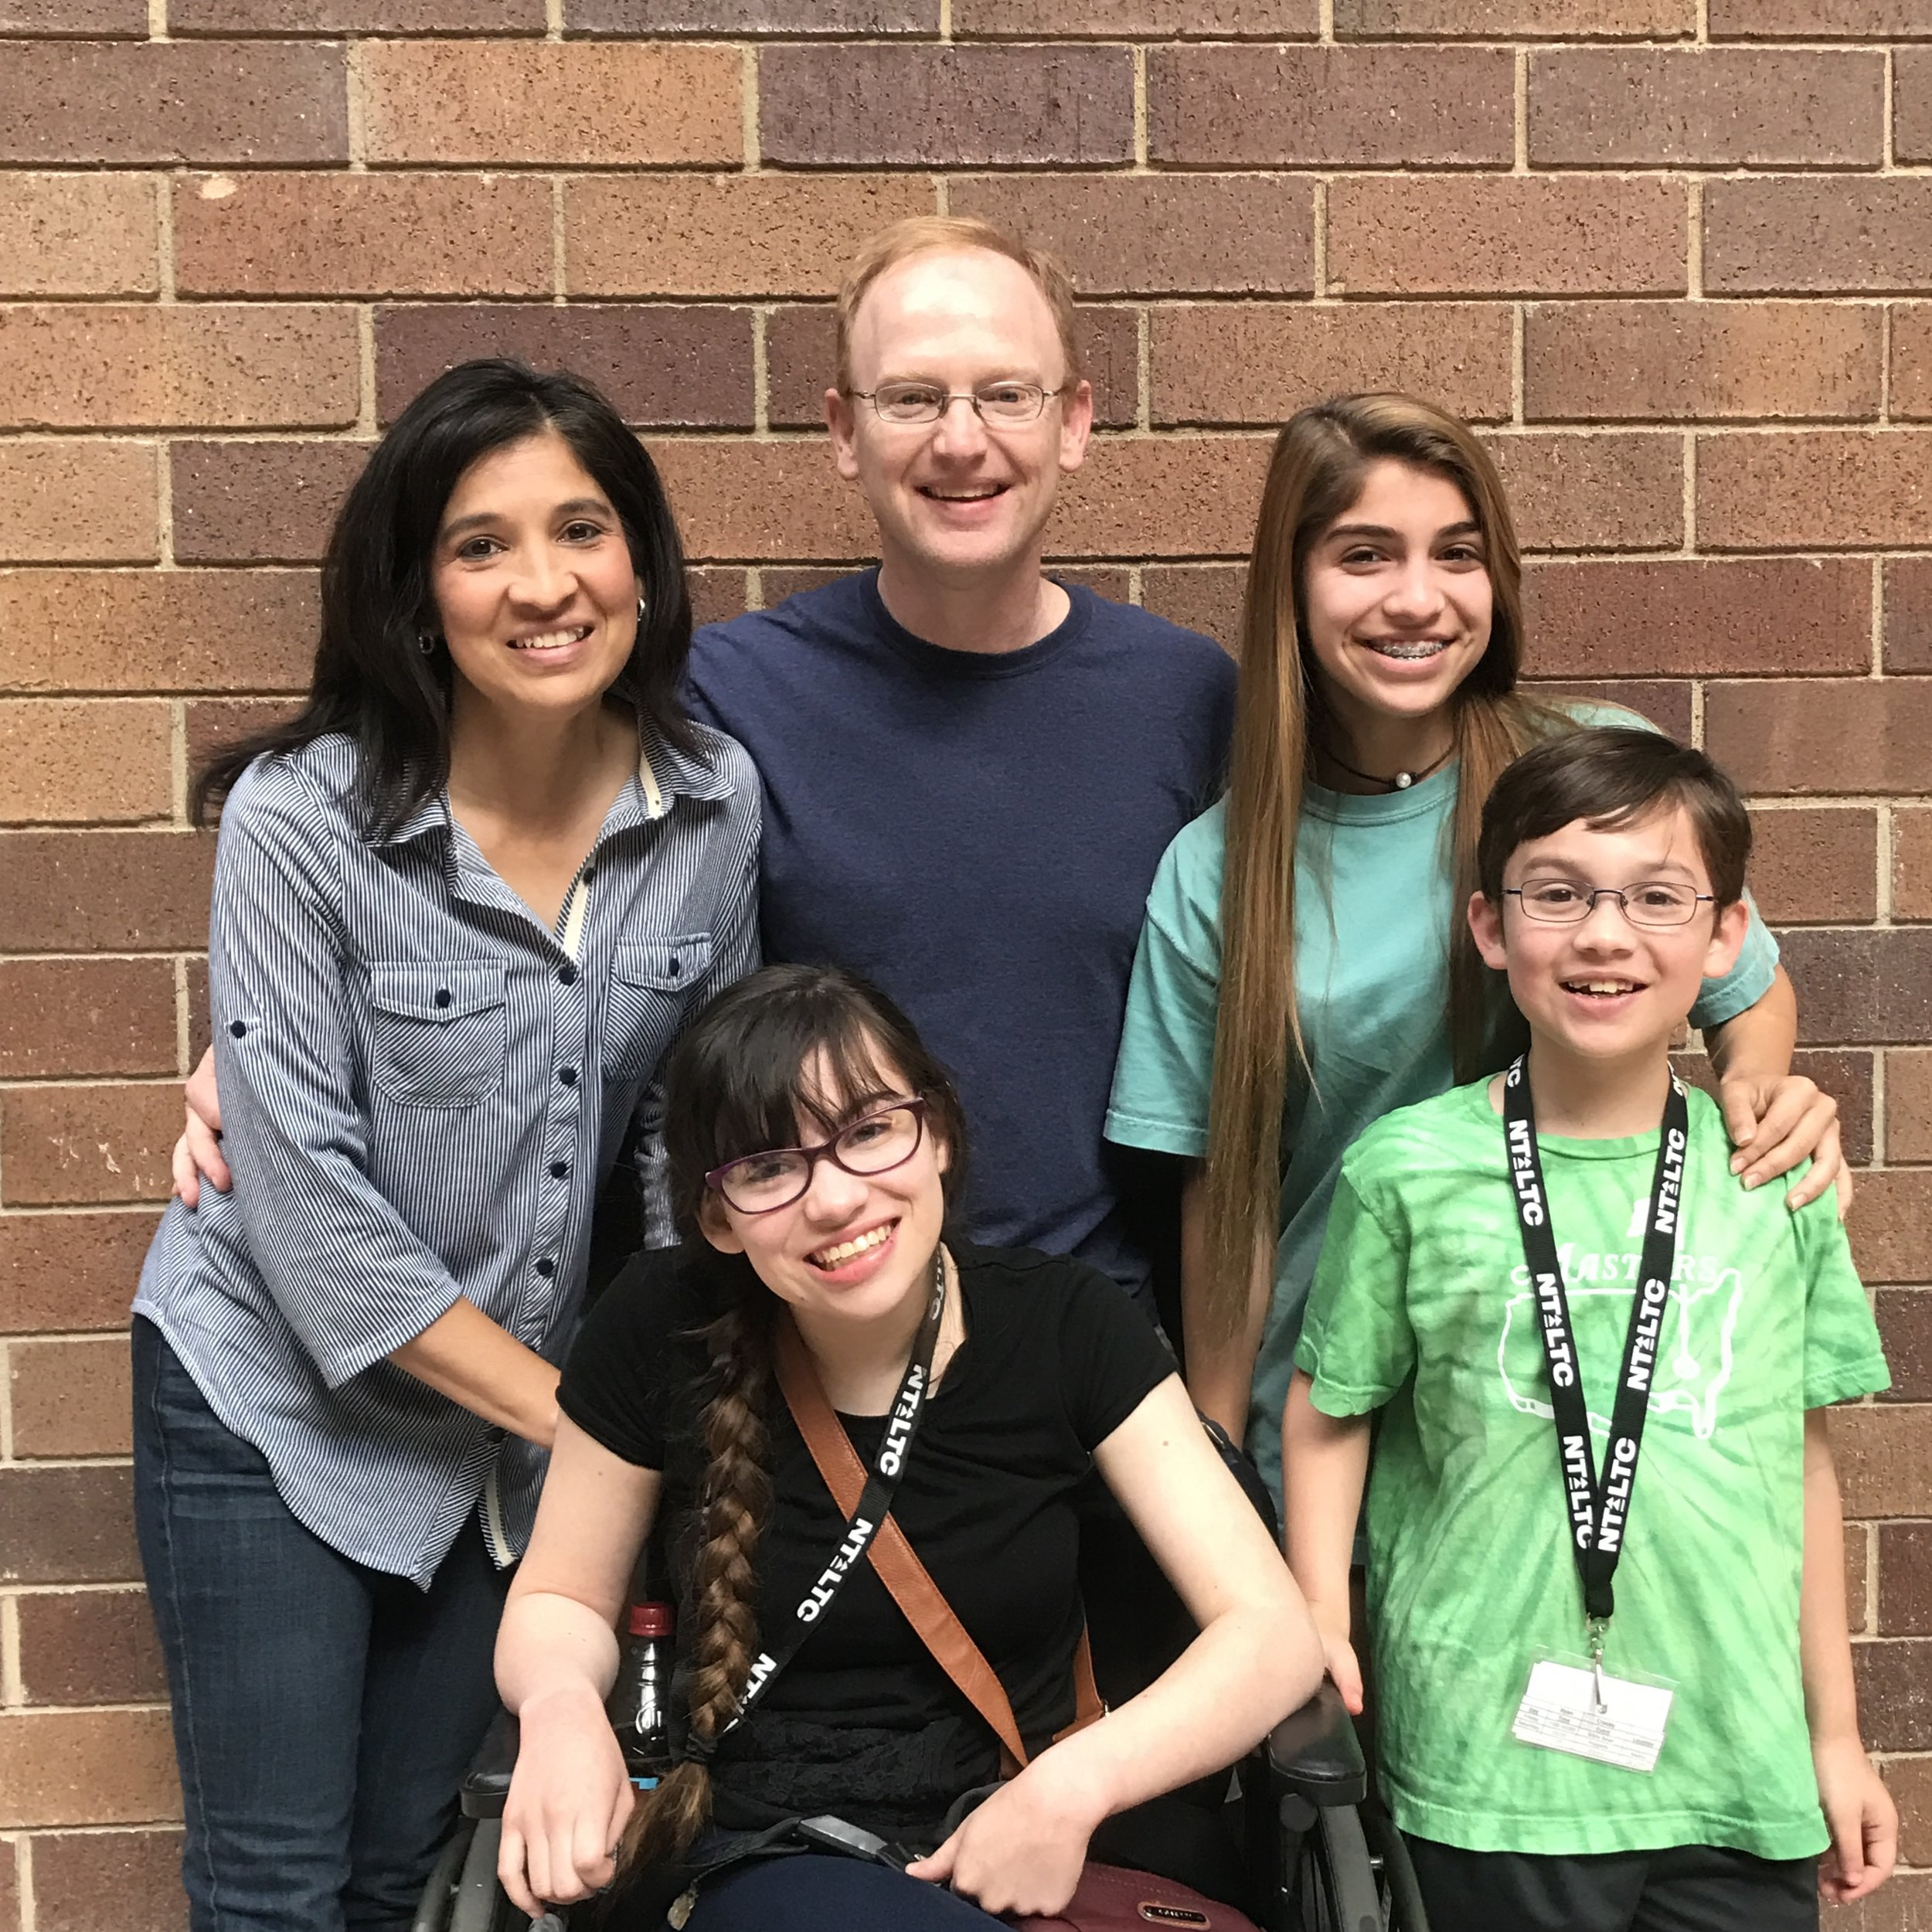 Burke & Tilly, with children Brooke, Katie, & Ryan